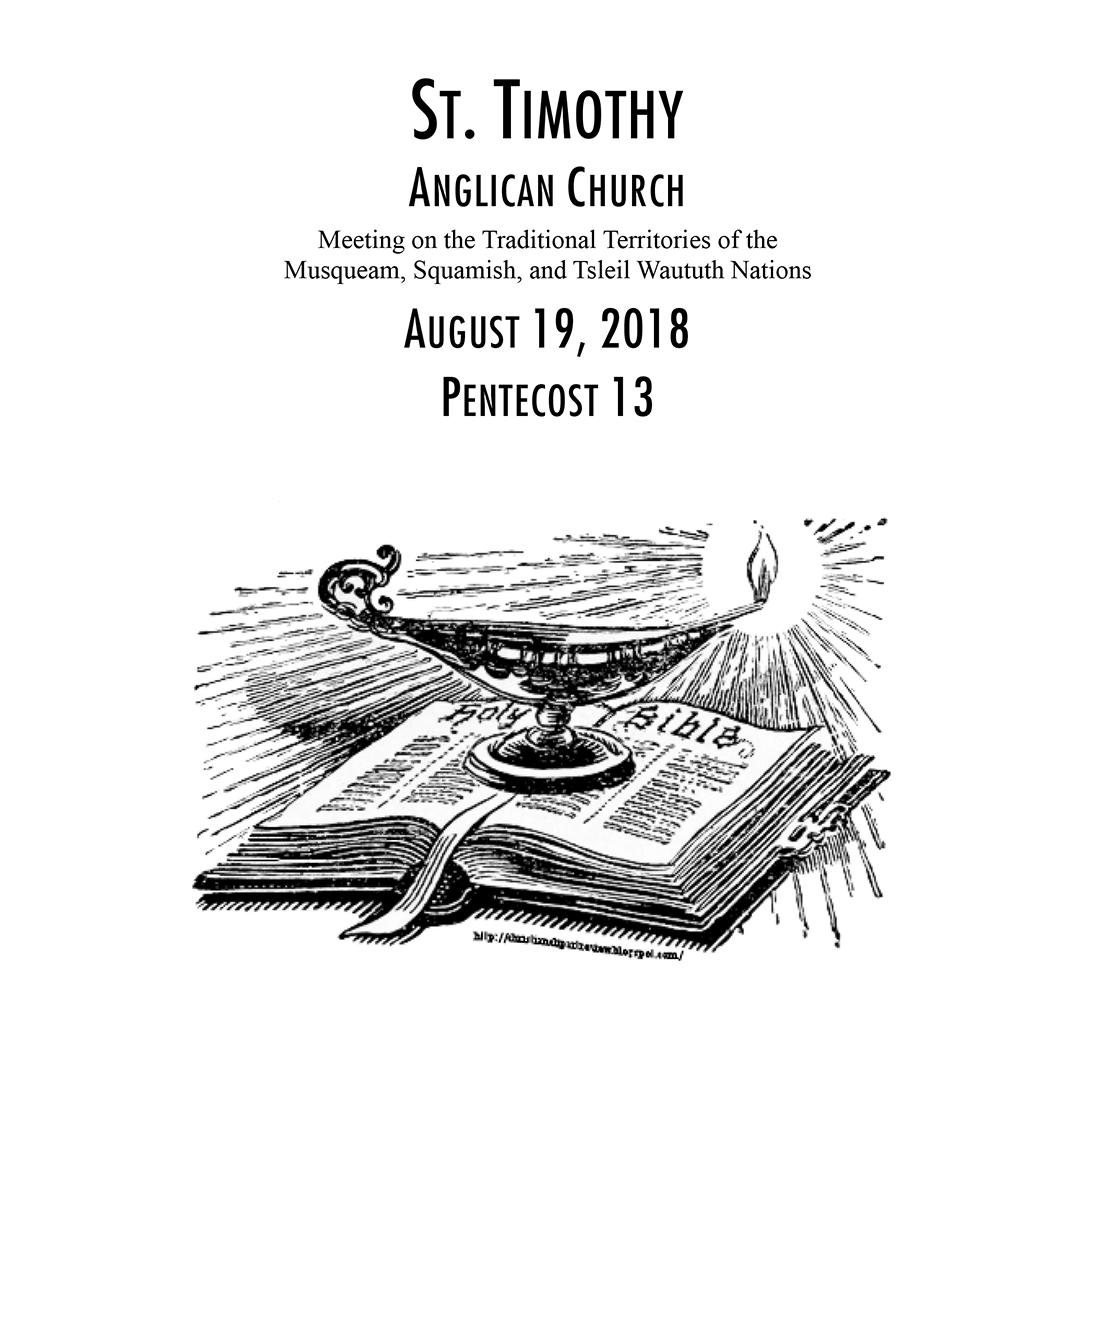 Bulletin: August 19, 2018